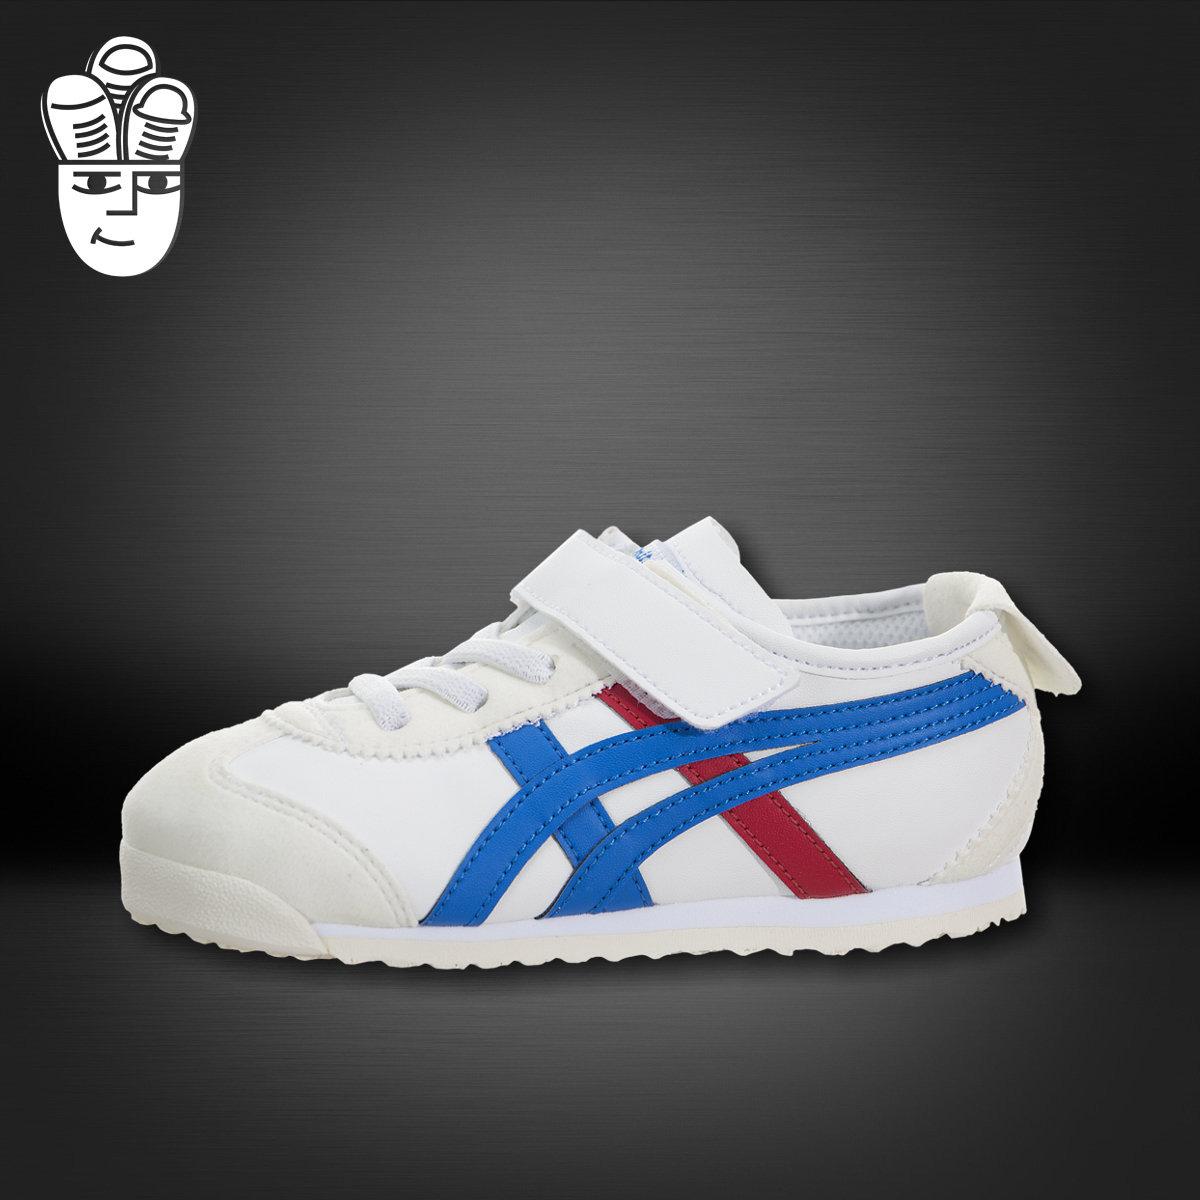 onitsuka tiger shoes baby shoes retro